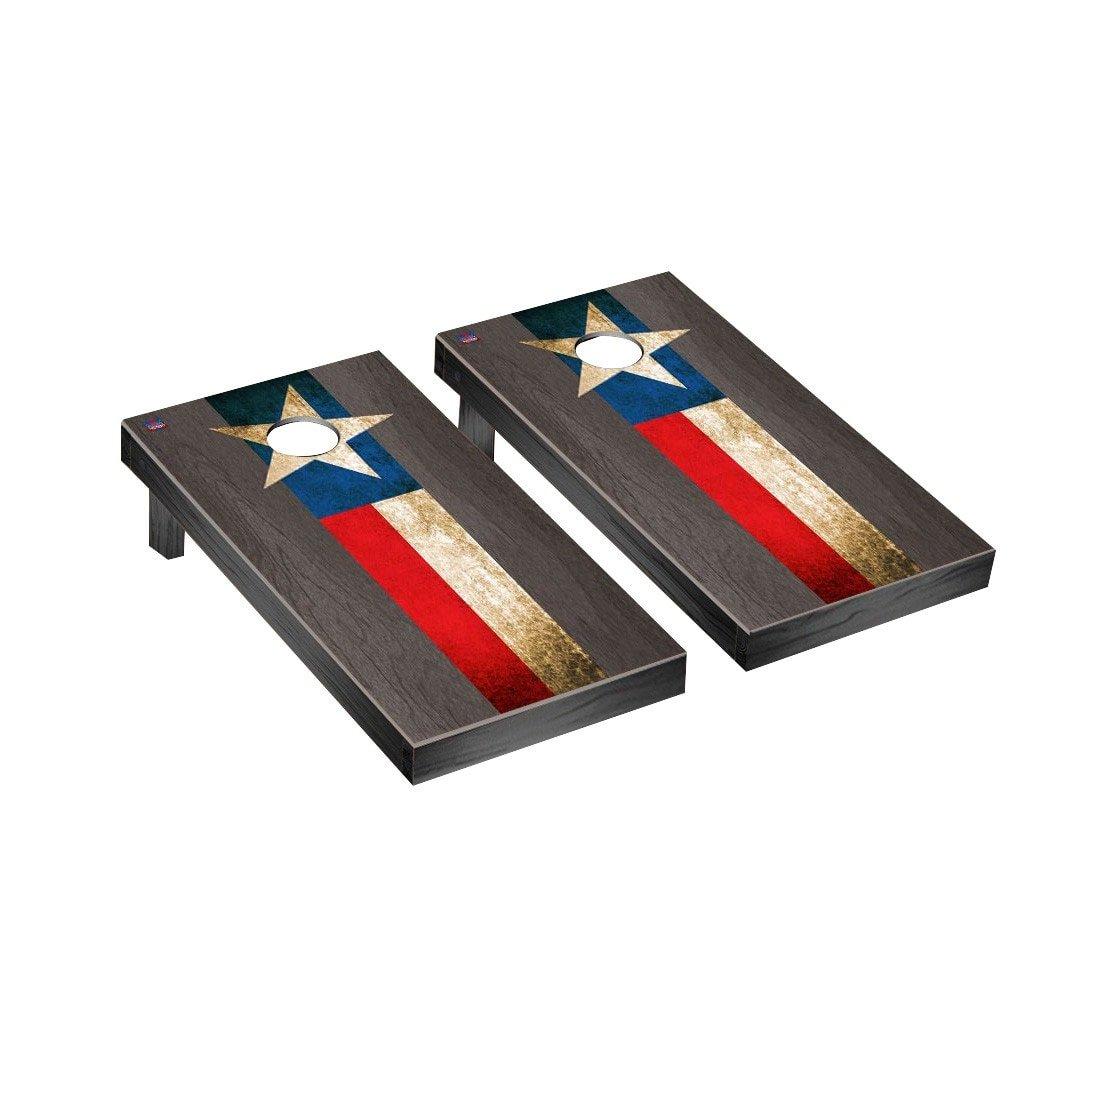 Texas FlagヴィンテージCornhole Game SetオニキスStainedストライプバージョン B018UKLE9W